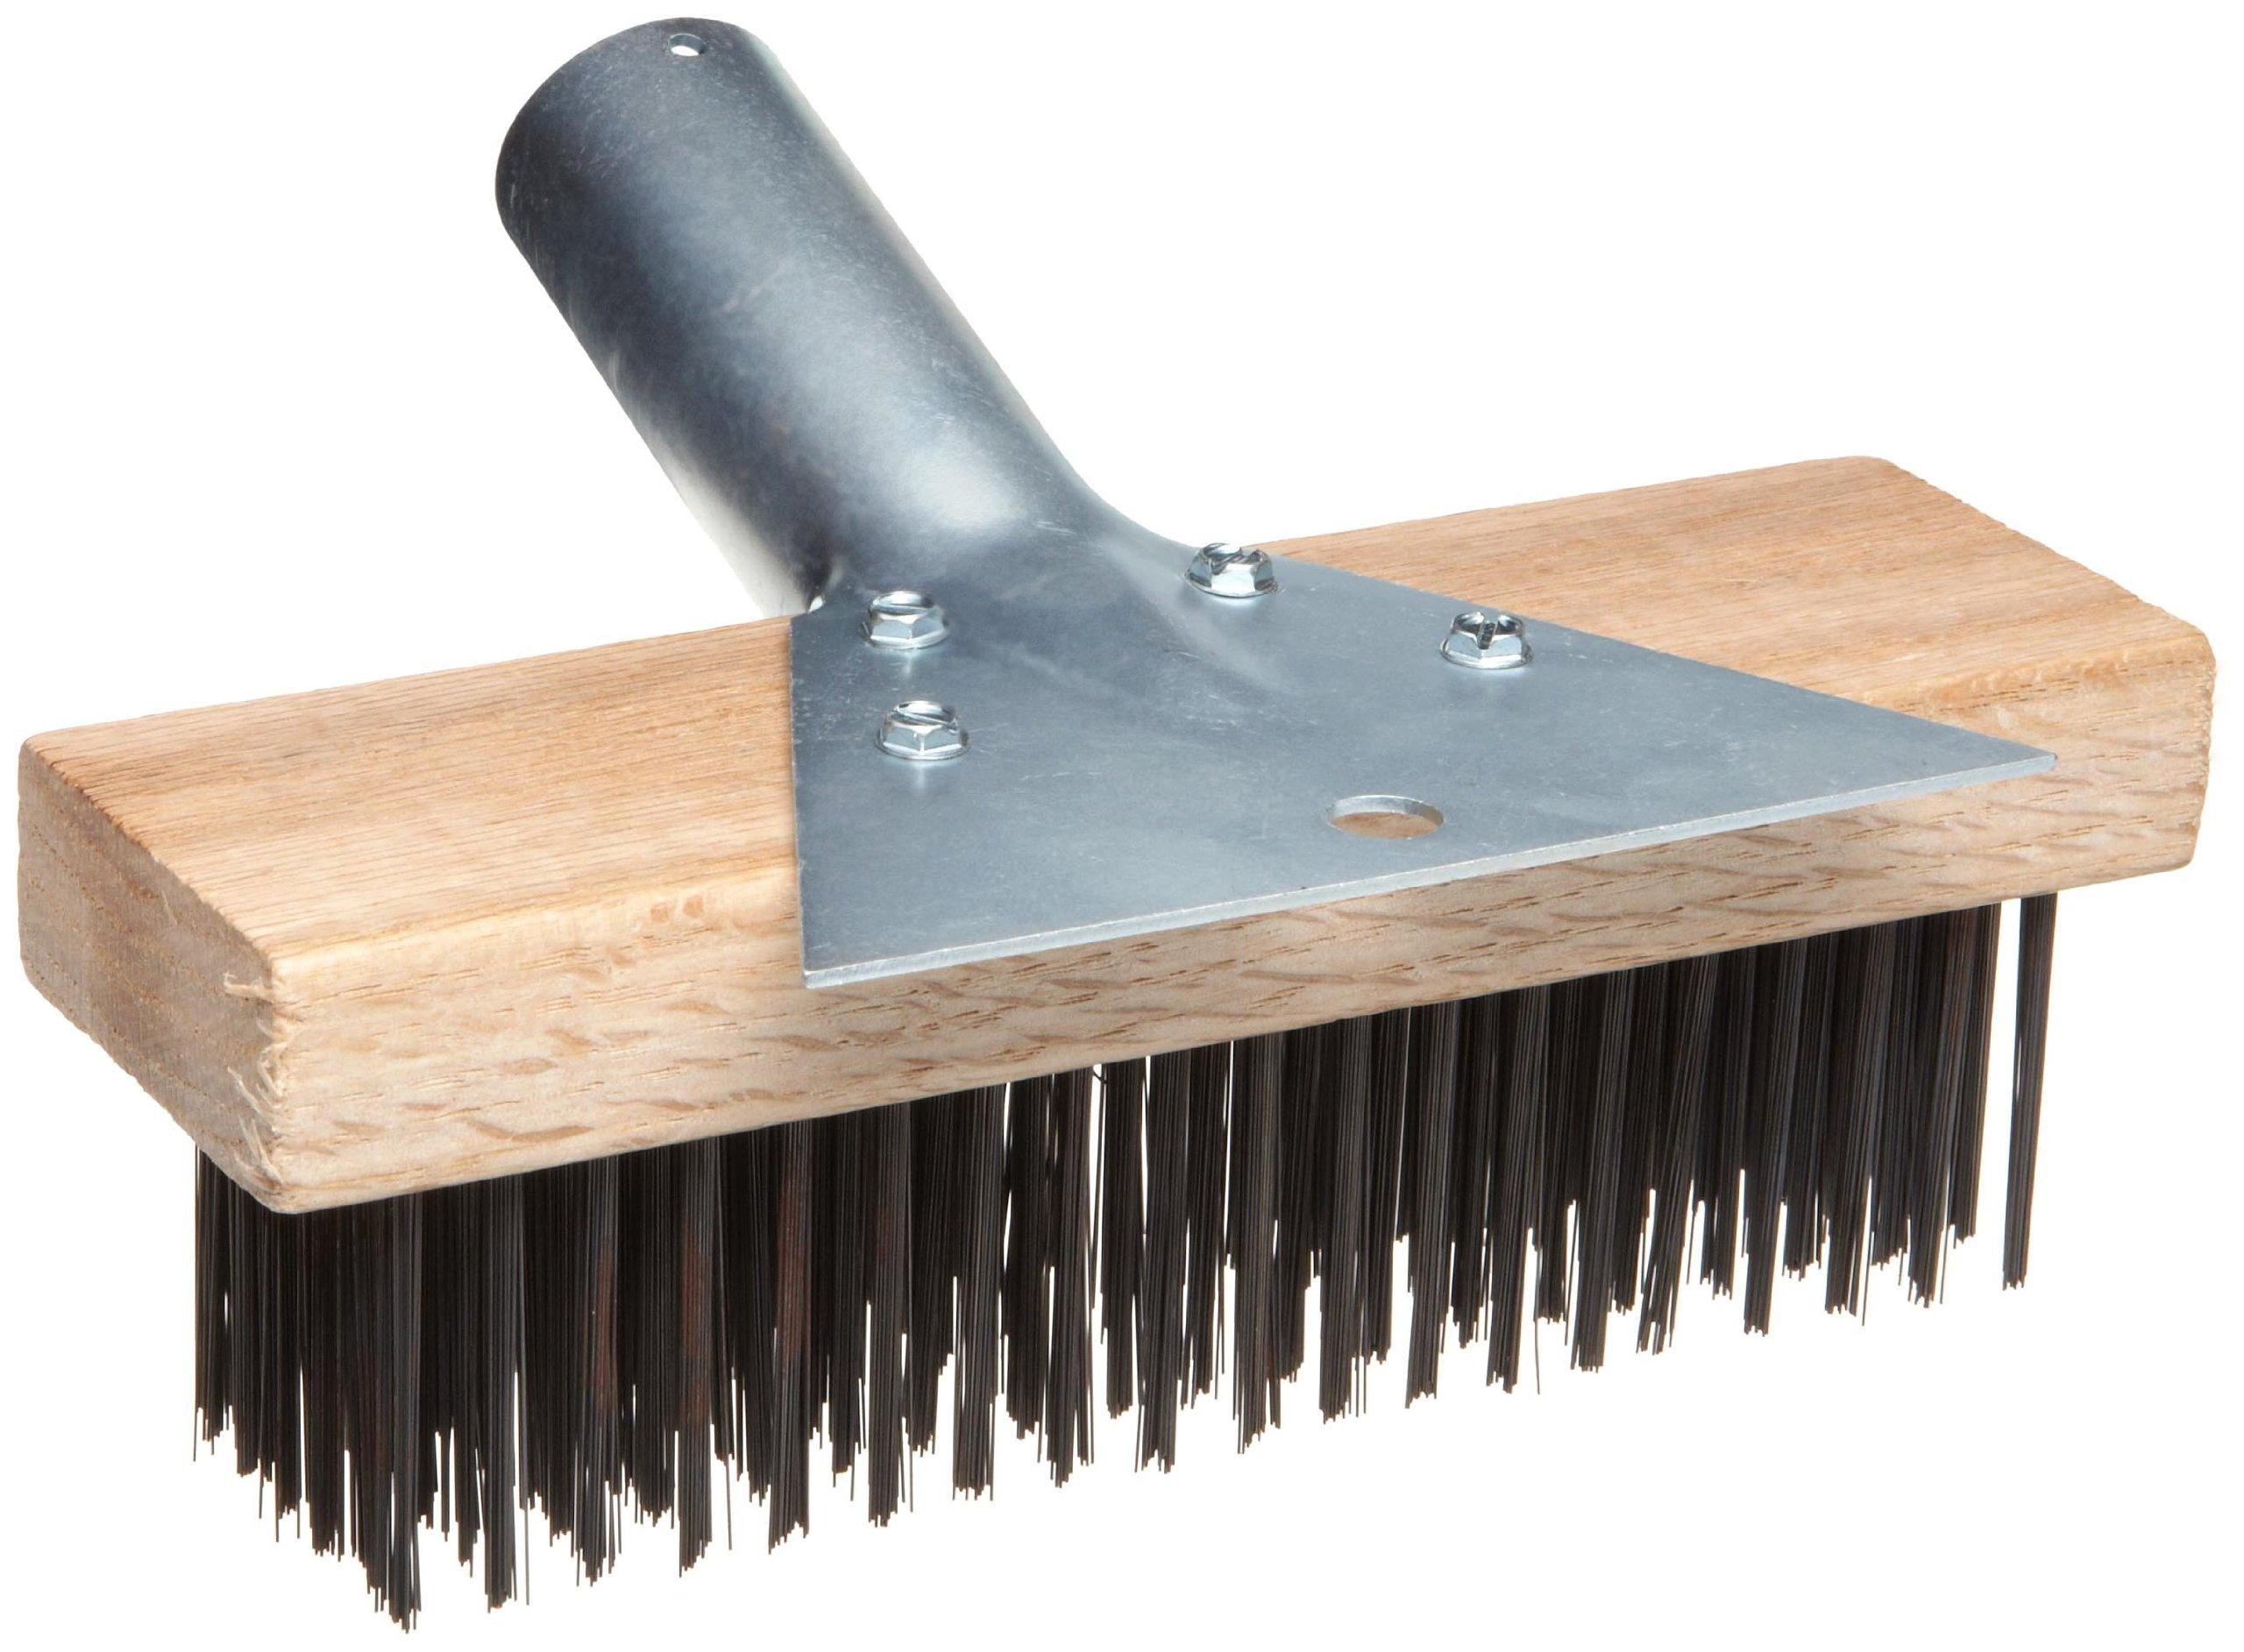 Magnolia Brush 5-SC-7 Round Painters Scratch Brush with Scraper, Carbon Steel Wire Bristles, 1-9/16'' Trim, 7-1/8'' Length x 2-1/4'' Width (Case of 12)